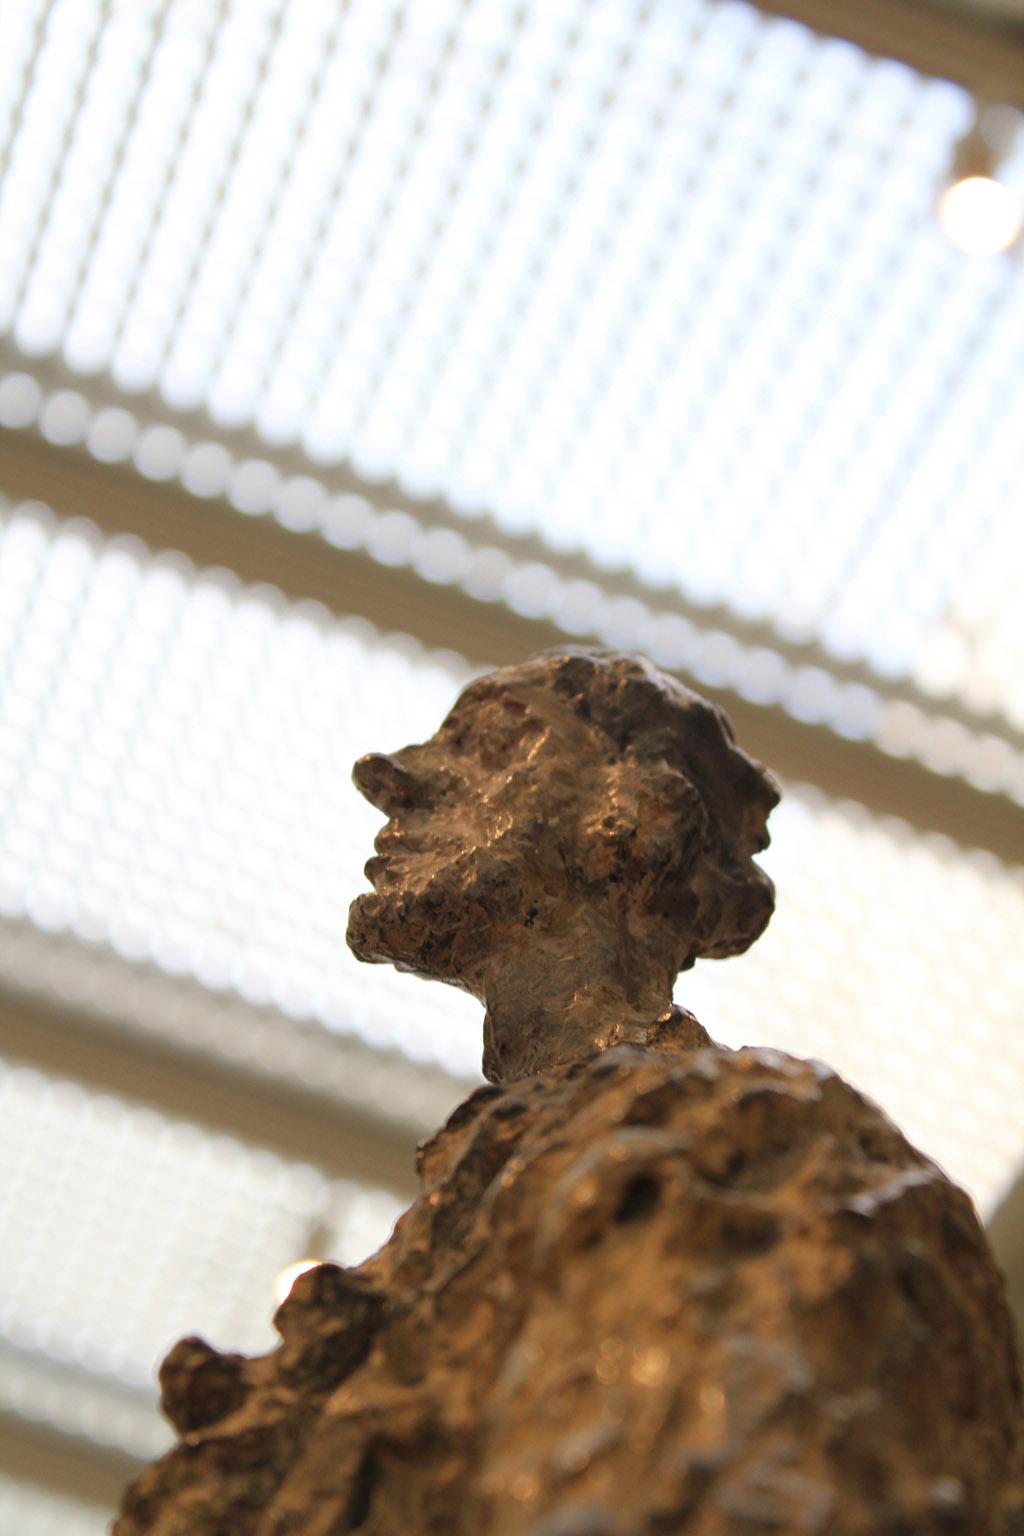 Nasher Sculpture Centre, Dallas - Photo Essay by Amit Khanna (8).JPG